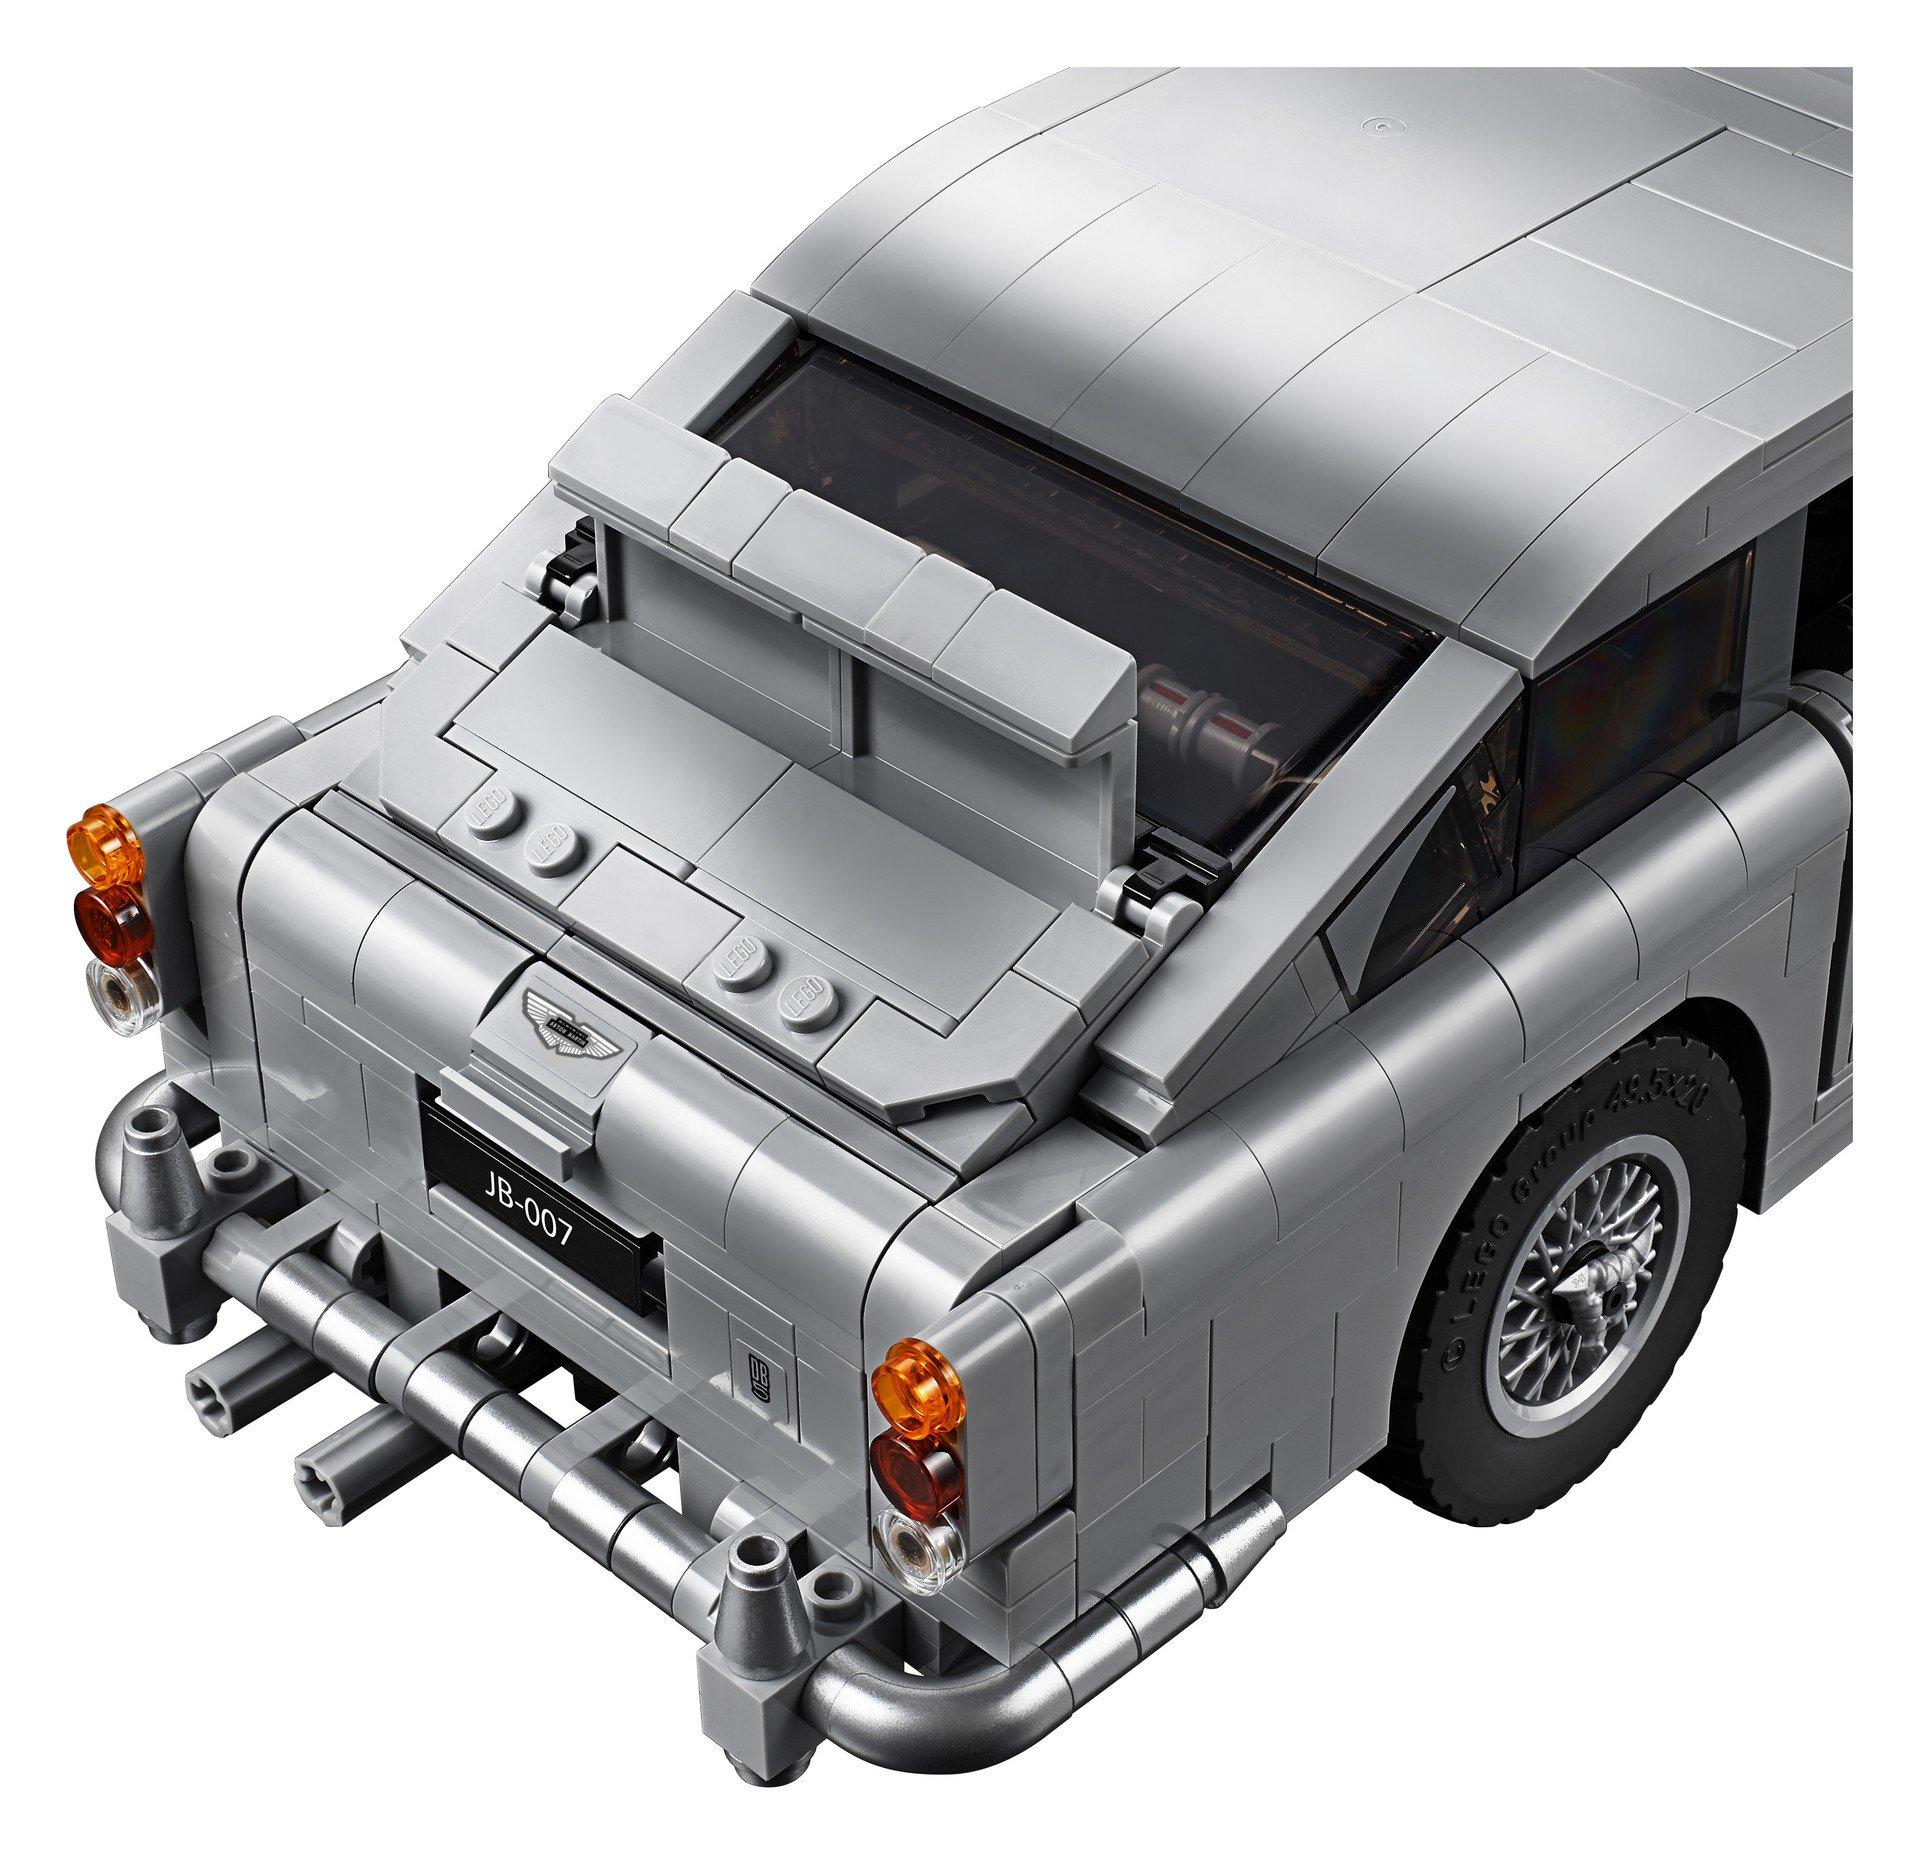 Lego Aston Martin DB5 (78)